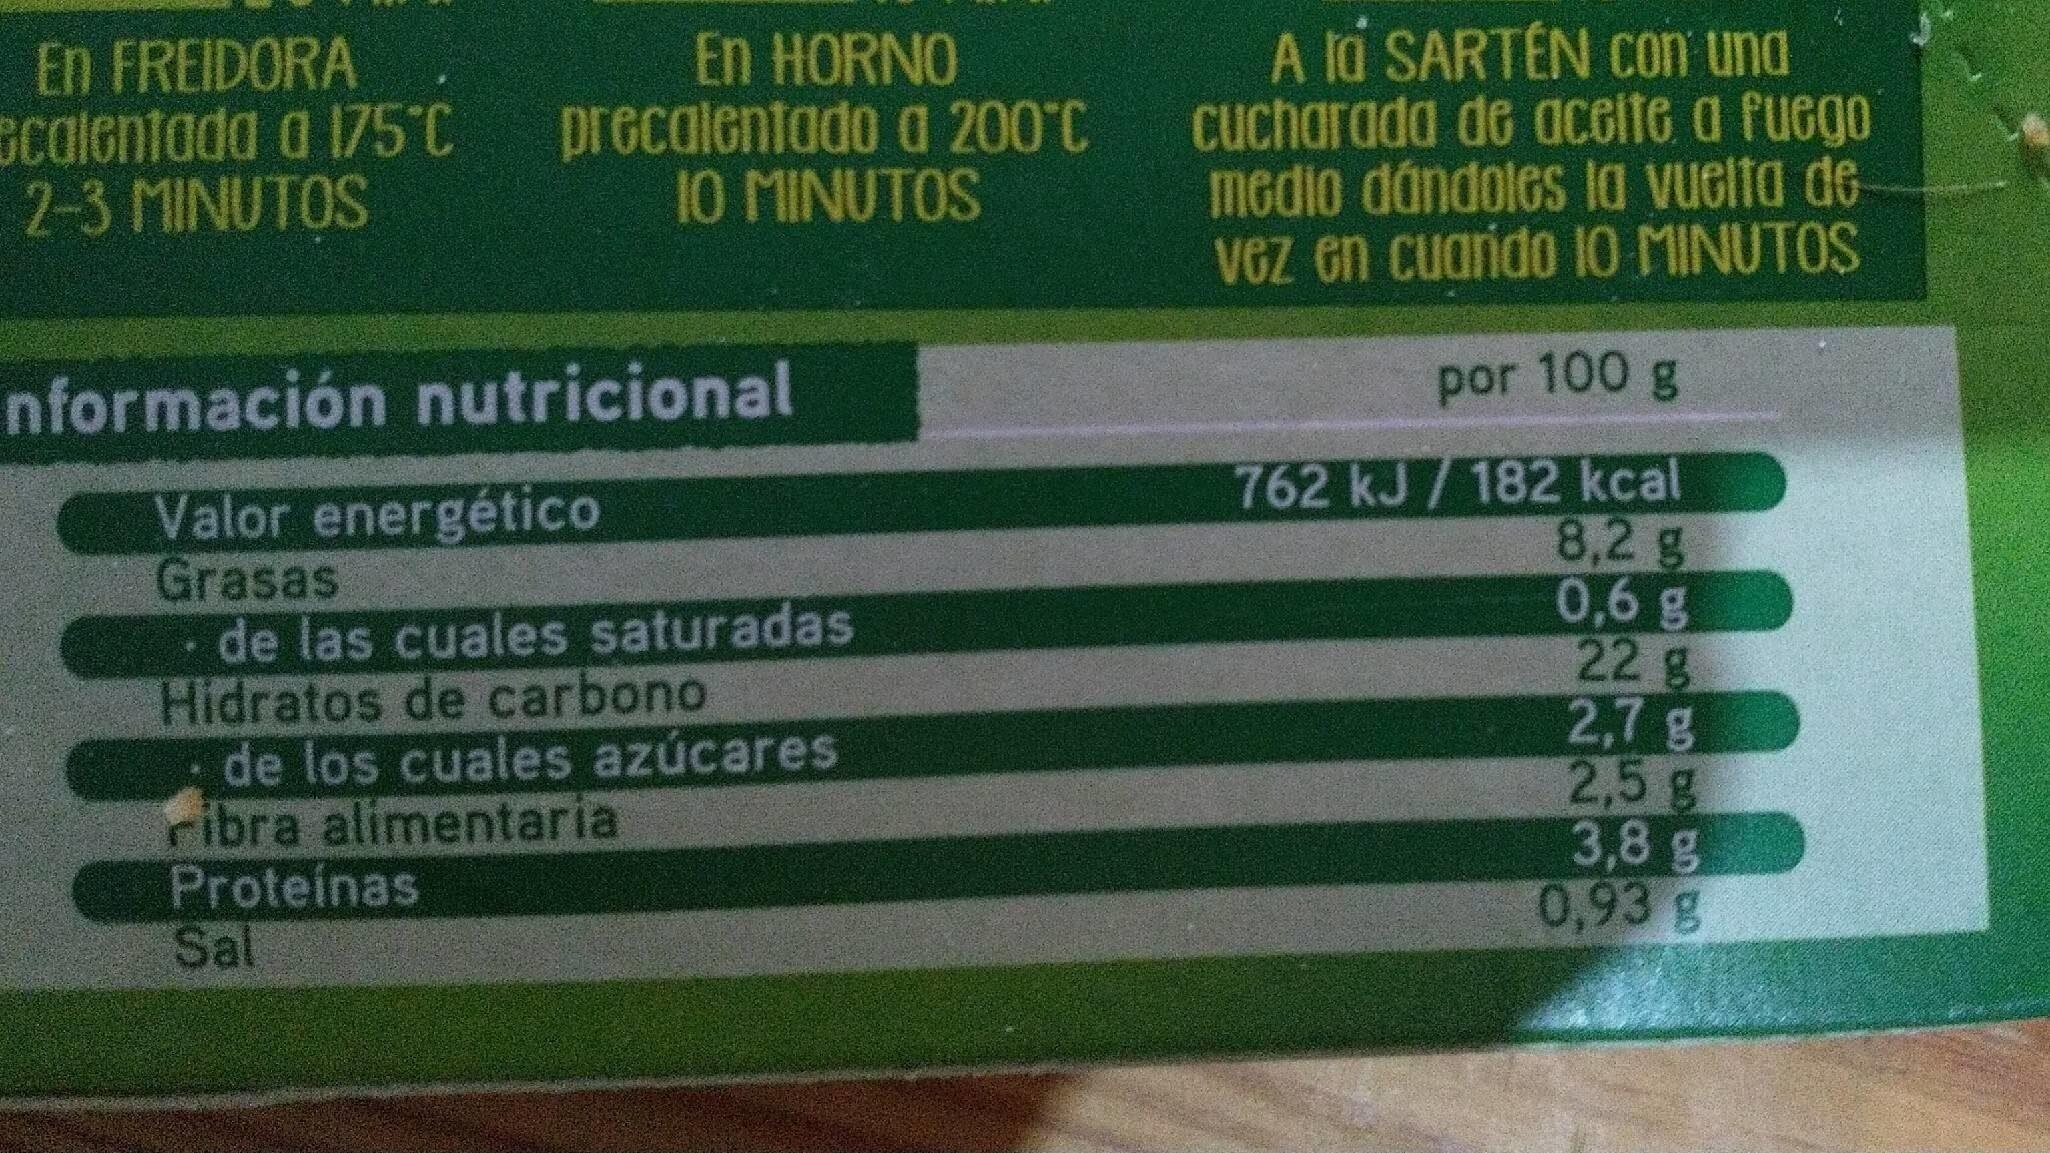 Varitas de verdura - Informations nutritionnelles - es